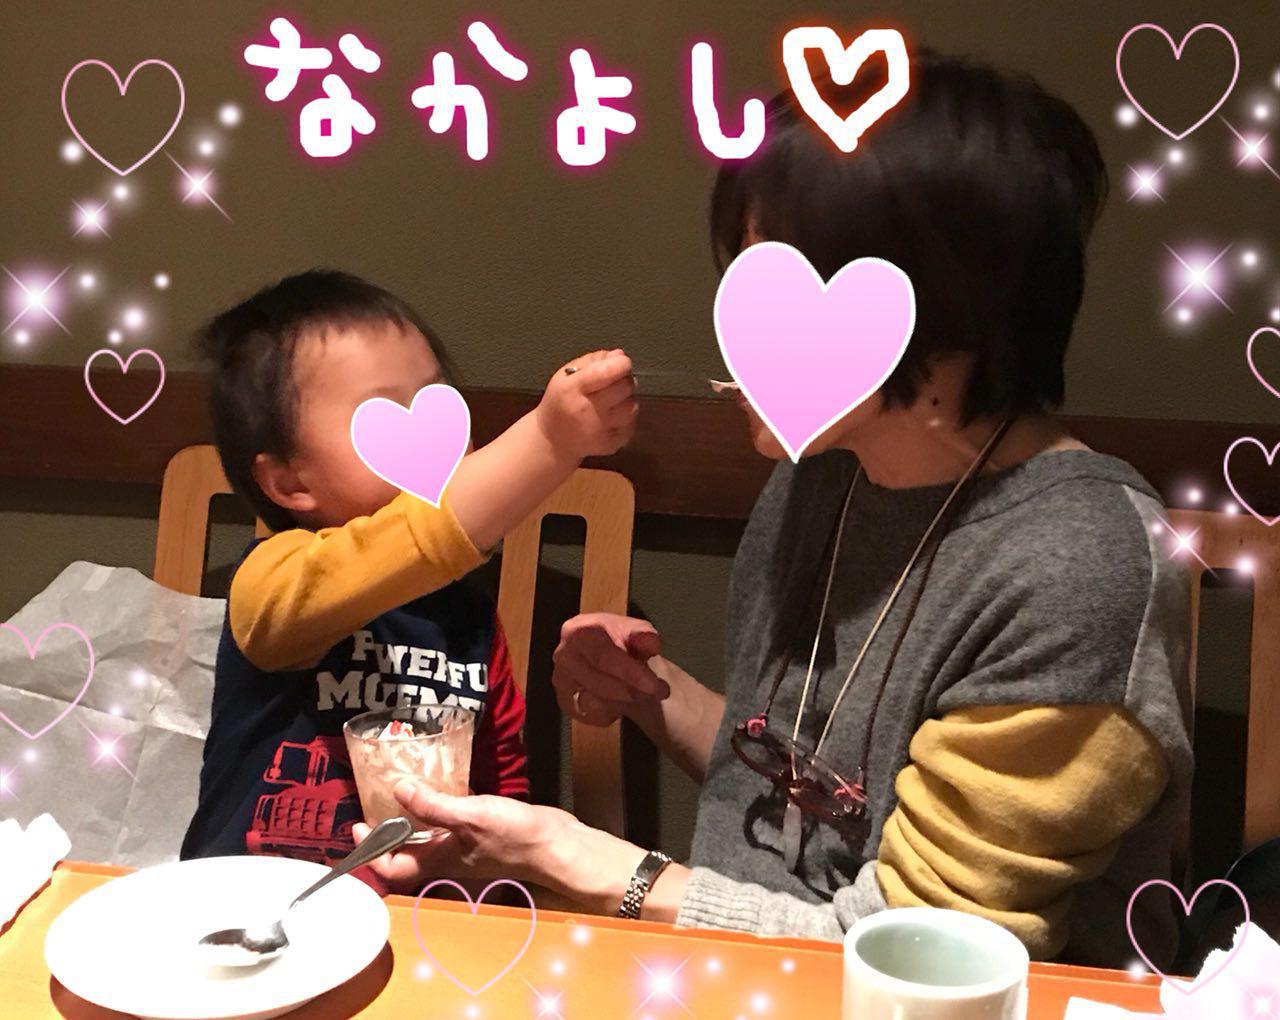 photo_2018-03-26_20-48-26.jpg